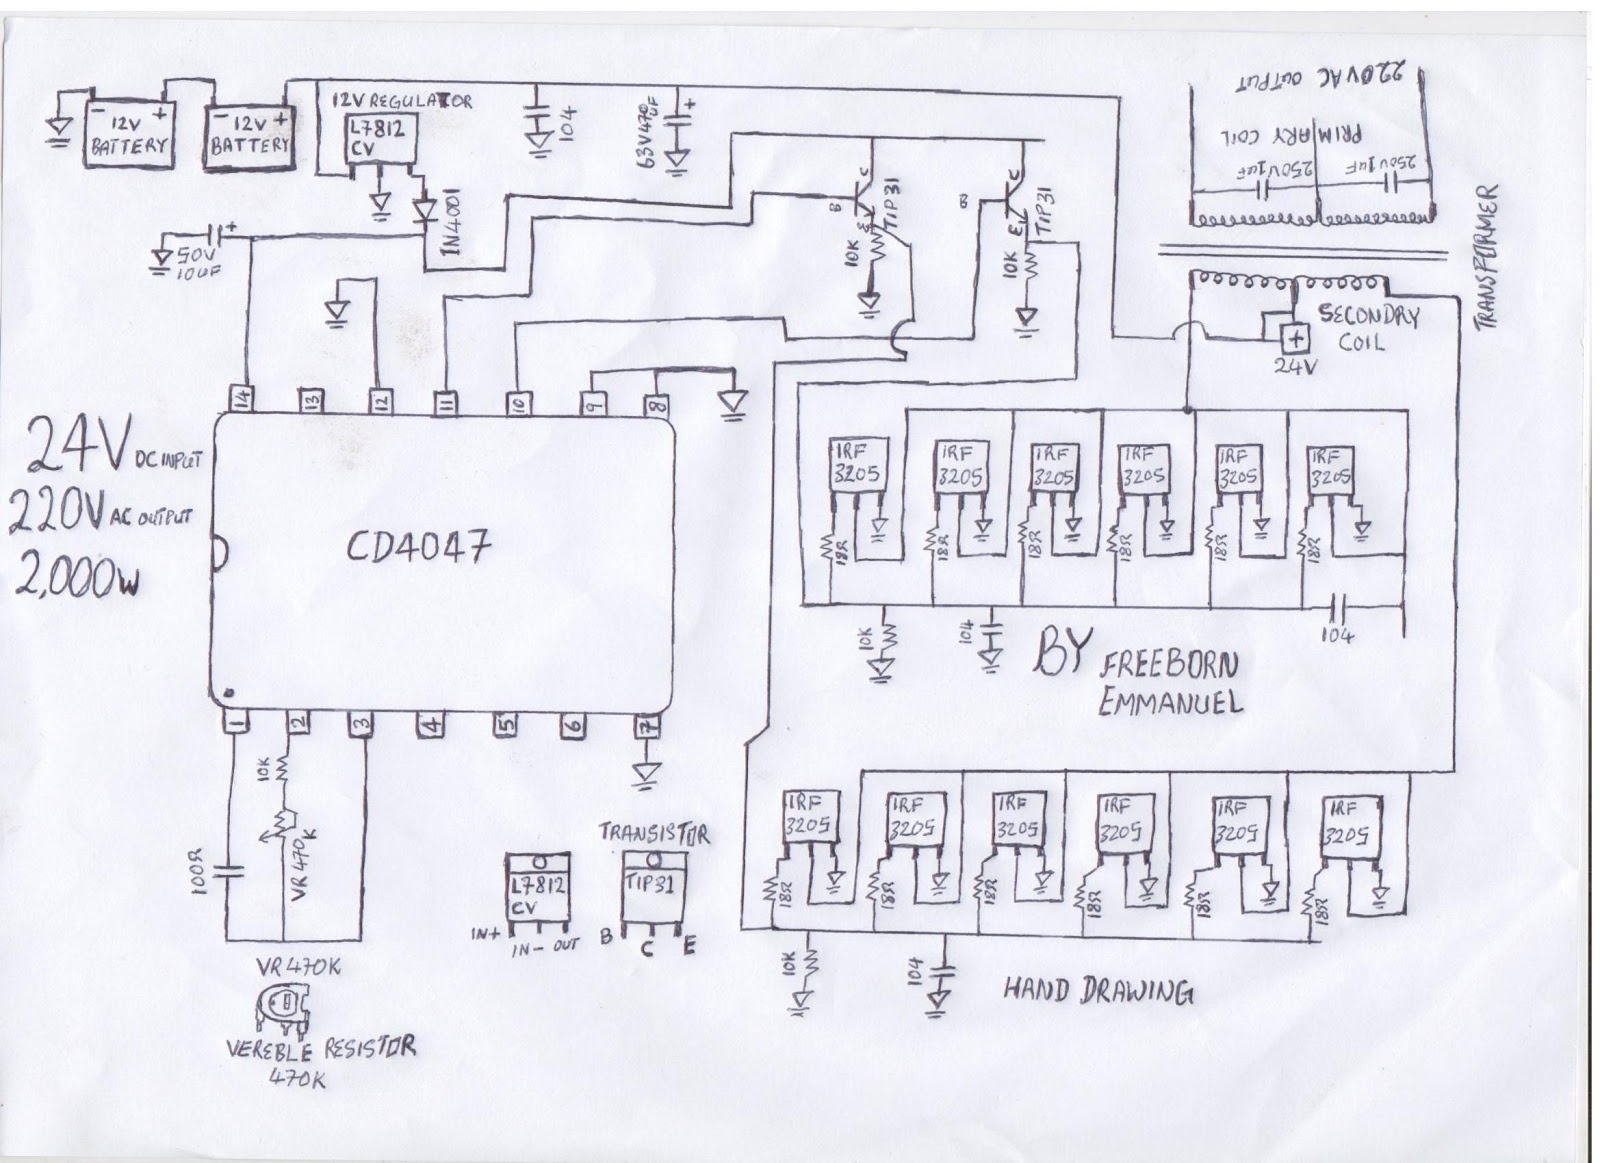 small resolution of 2000 watt inverter circuit diagram wiring diagram for you 2000w power inverter circuit diagram 2000w inverter wiring diagram